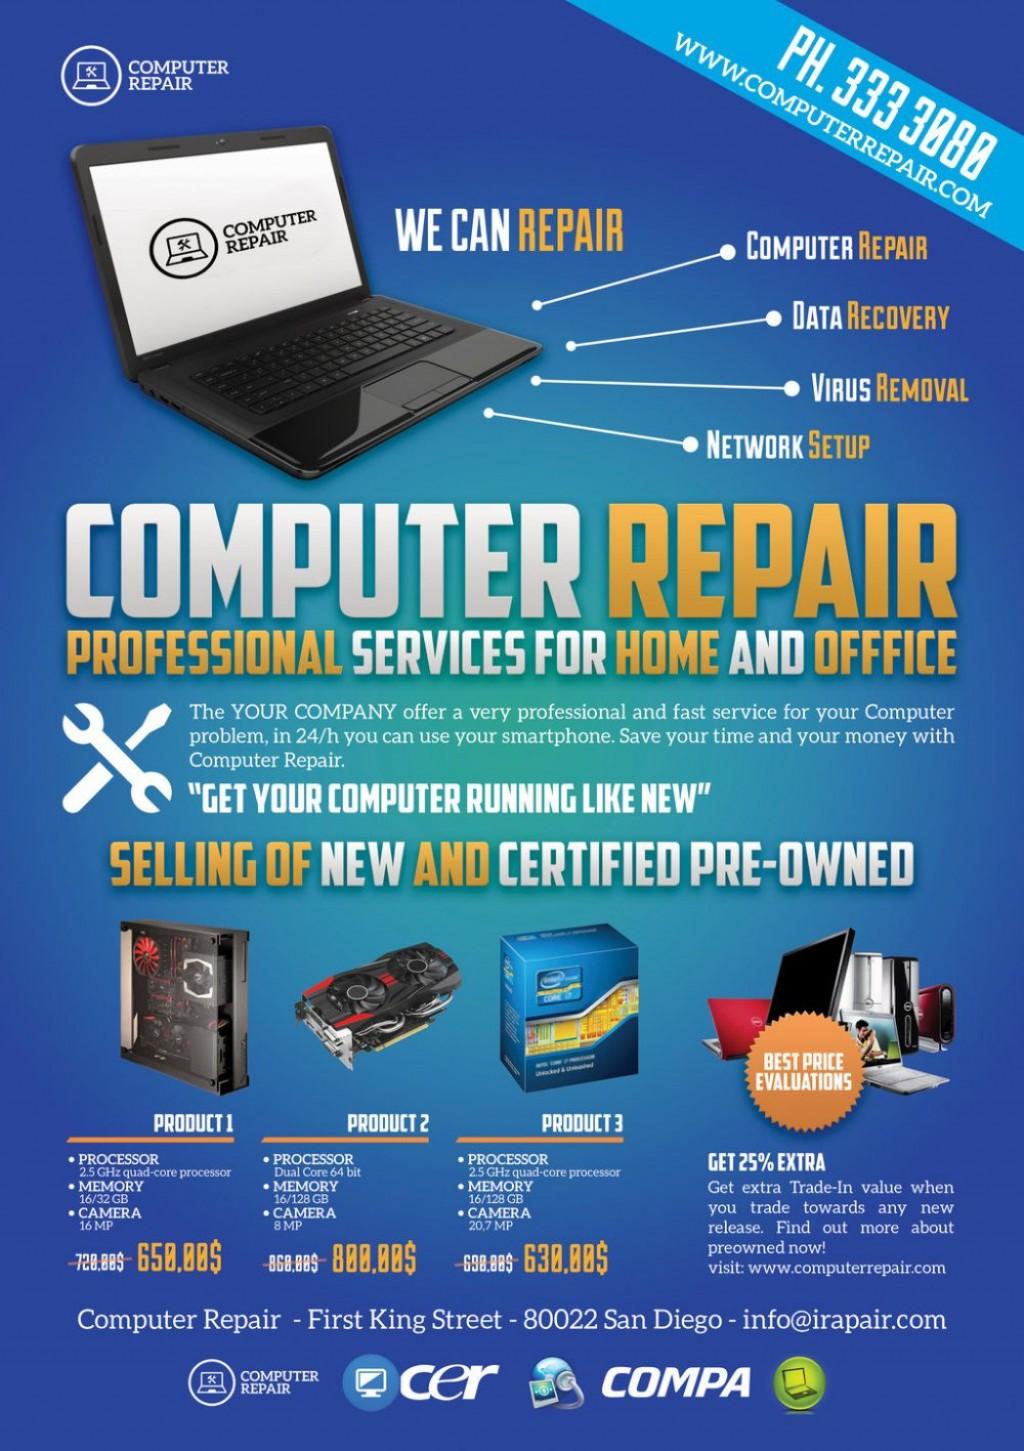 003 Unusual Computer Repair Flyer Template Highest Quality  Word Busines FreeLarge